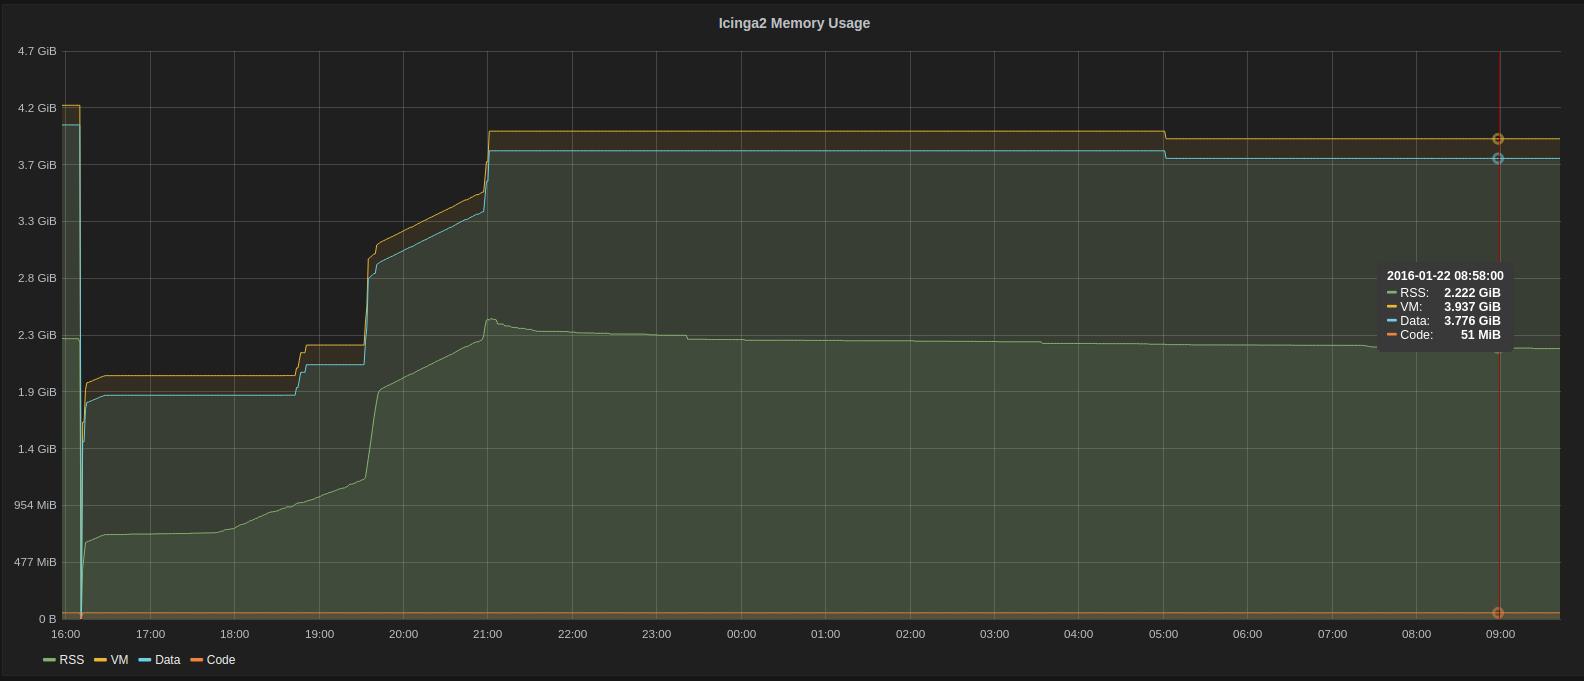 icinga2_memory_r2.4.1-123-g72c3b6d.png